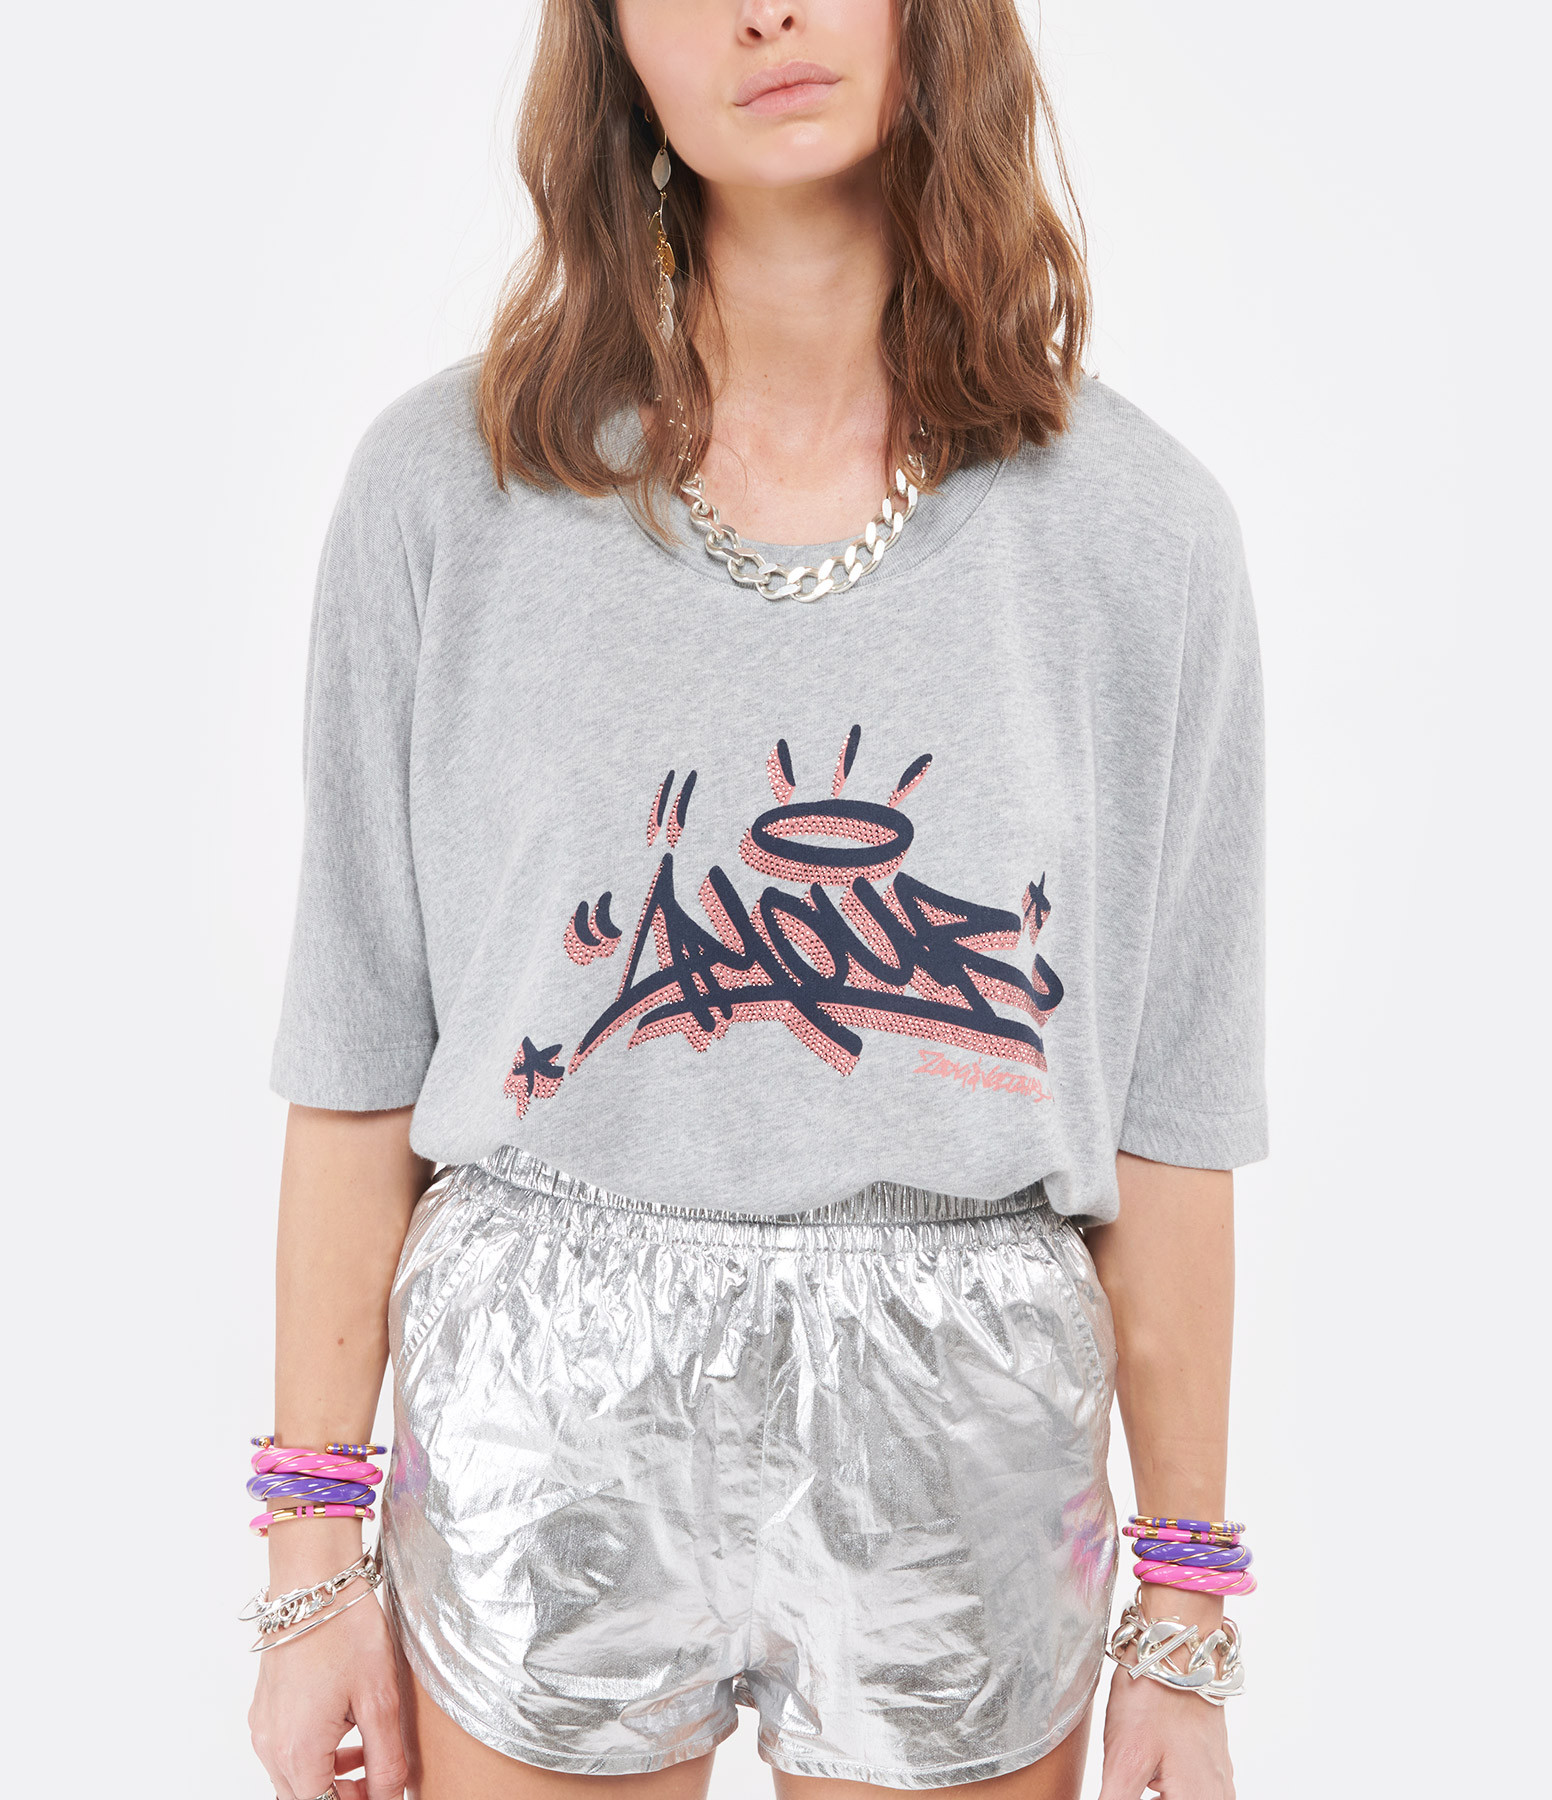 ZADIG & VOLTAIRE - Tee-shirt Portland Jormi Coton Modal Gris Chiné